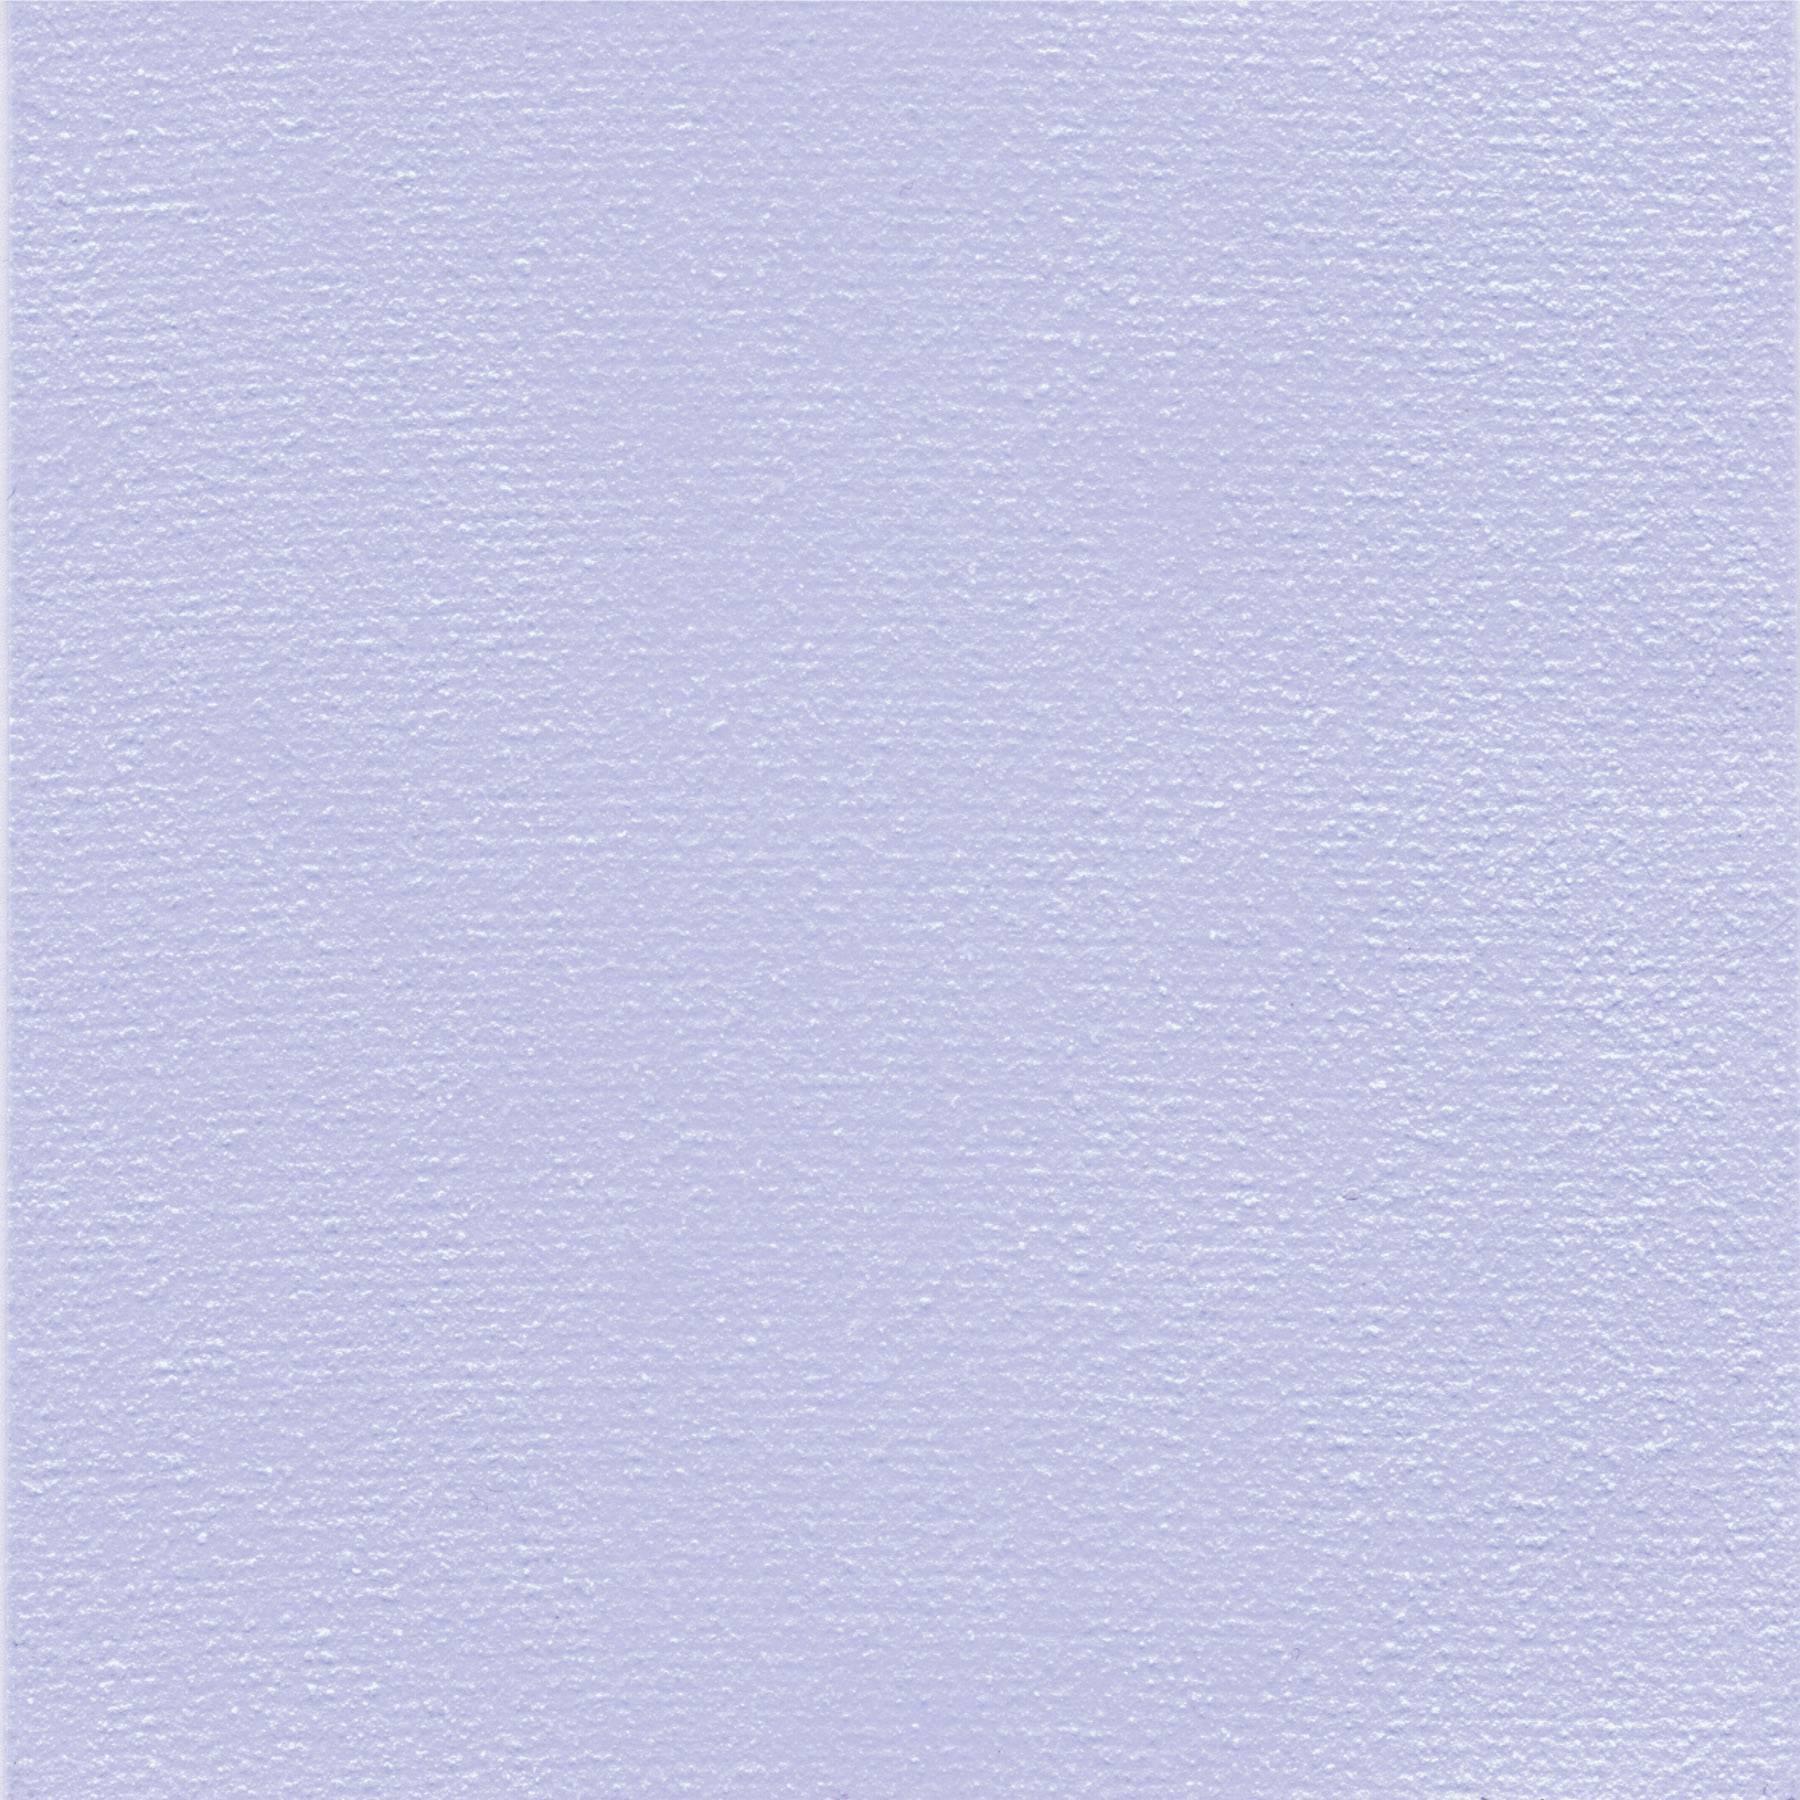 Teplovodivá fólia Kerafol SOFTTHERM 86/300, 3 mm, 3 W/mK, (d x š) 100 mm x 100 mm